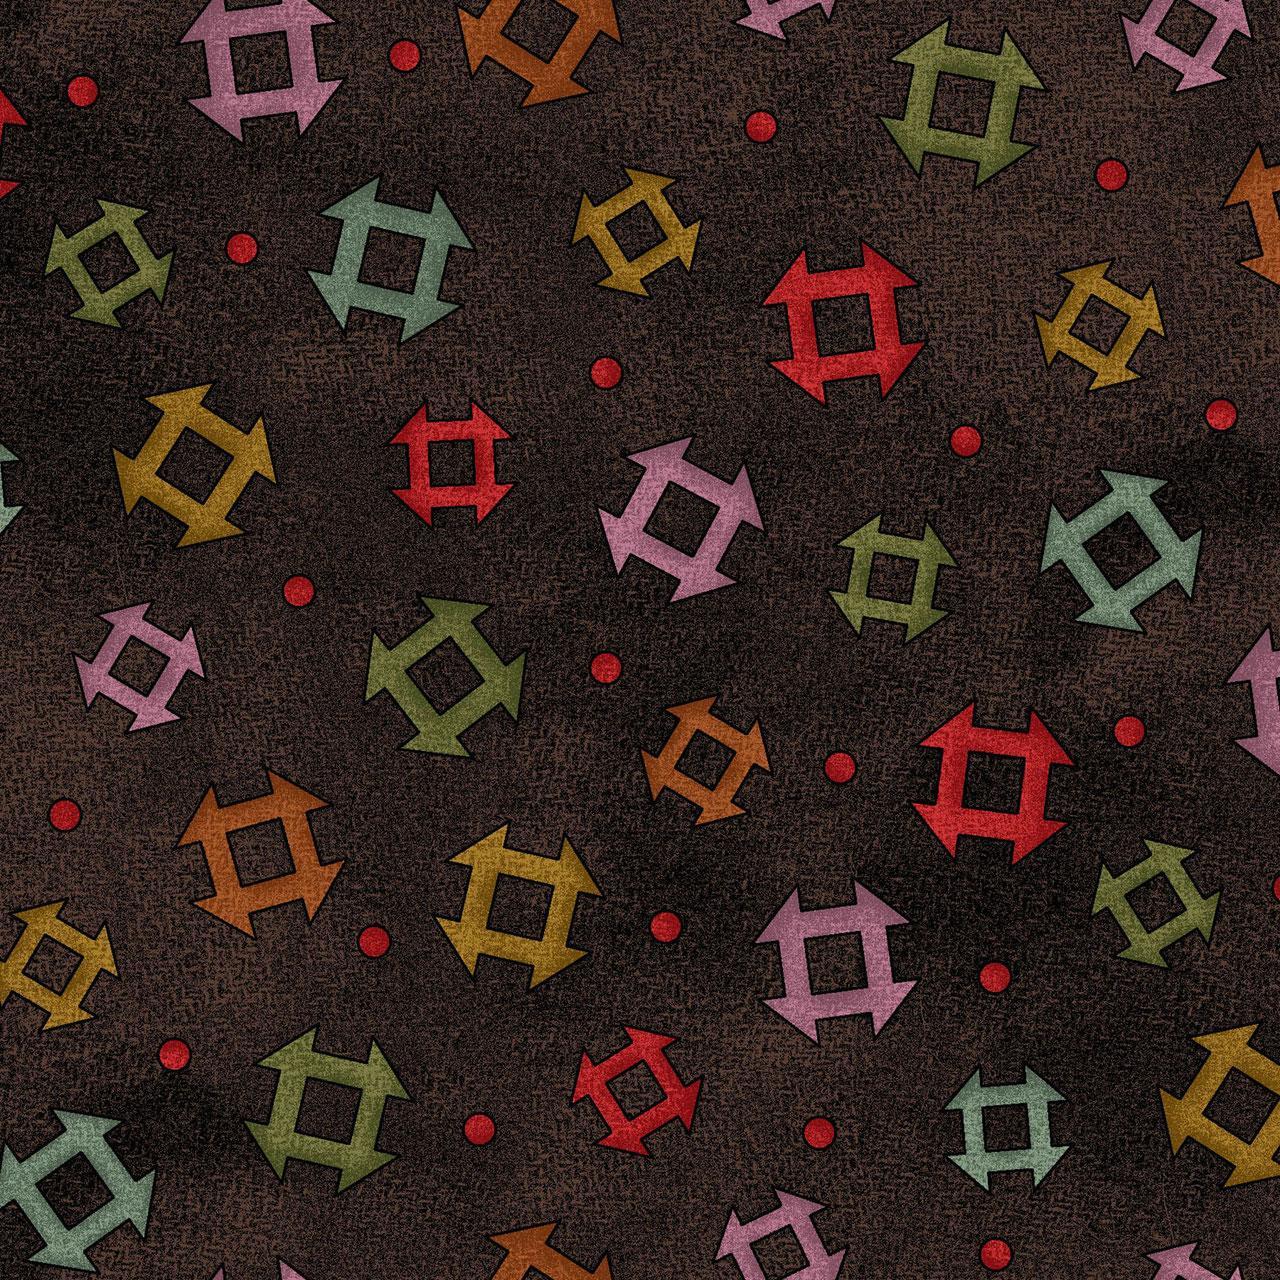 Tela patchwork franela oscura con pieceo de colores